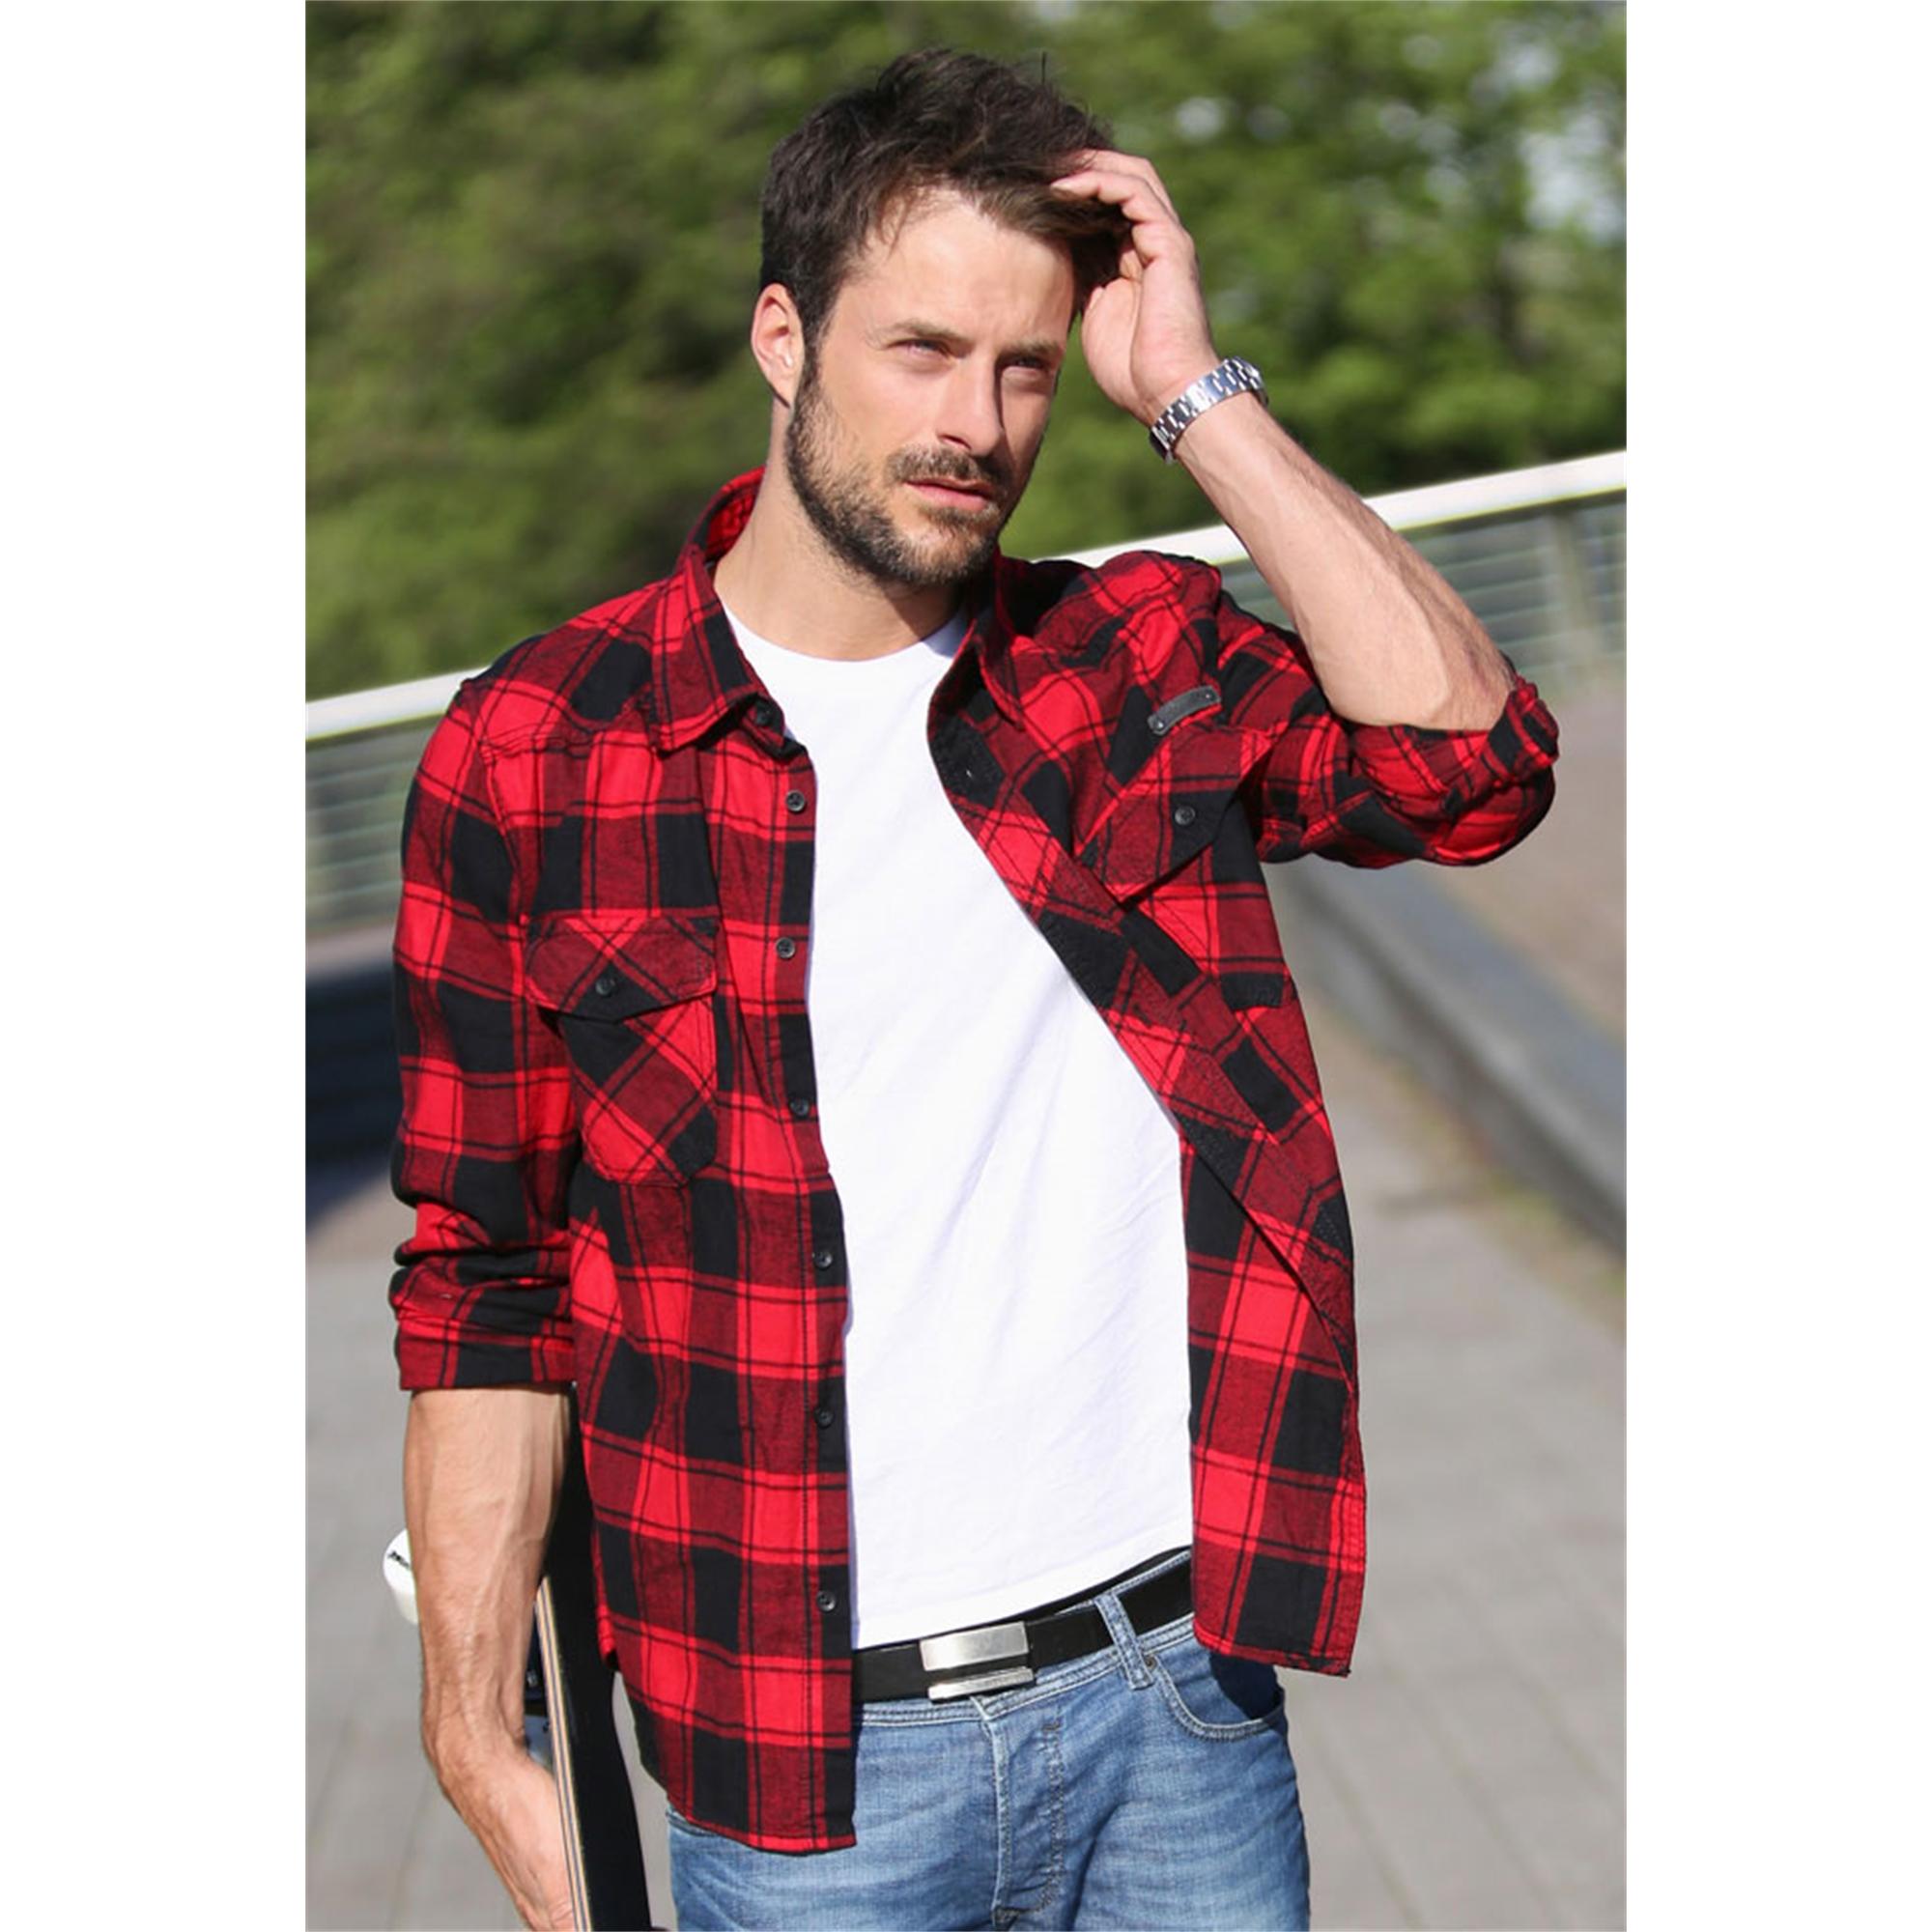 Indexbild 9 - Brandit Check Shirt Holzfäller Hemd Flanell Woodcutter Karo Freizeithemd S-7XL